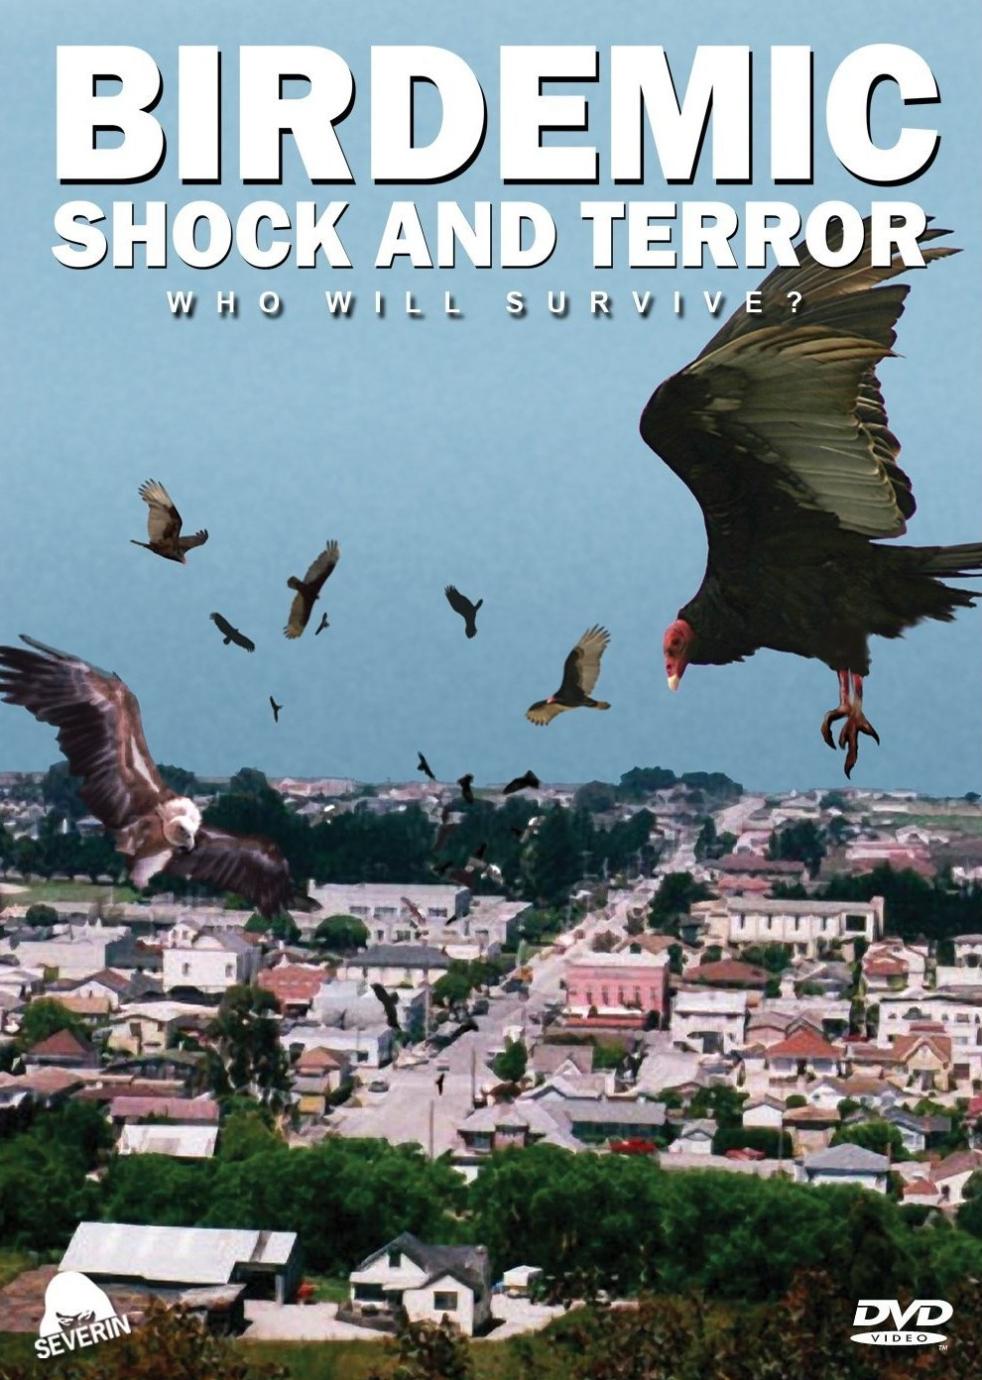 Birdemic - Shock and Horror Image